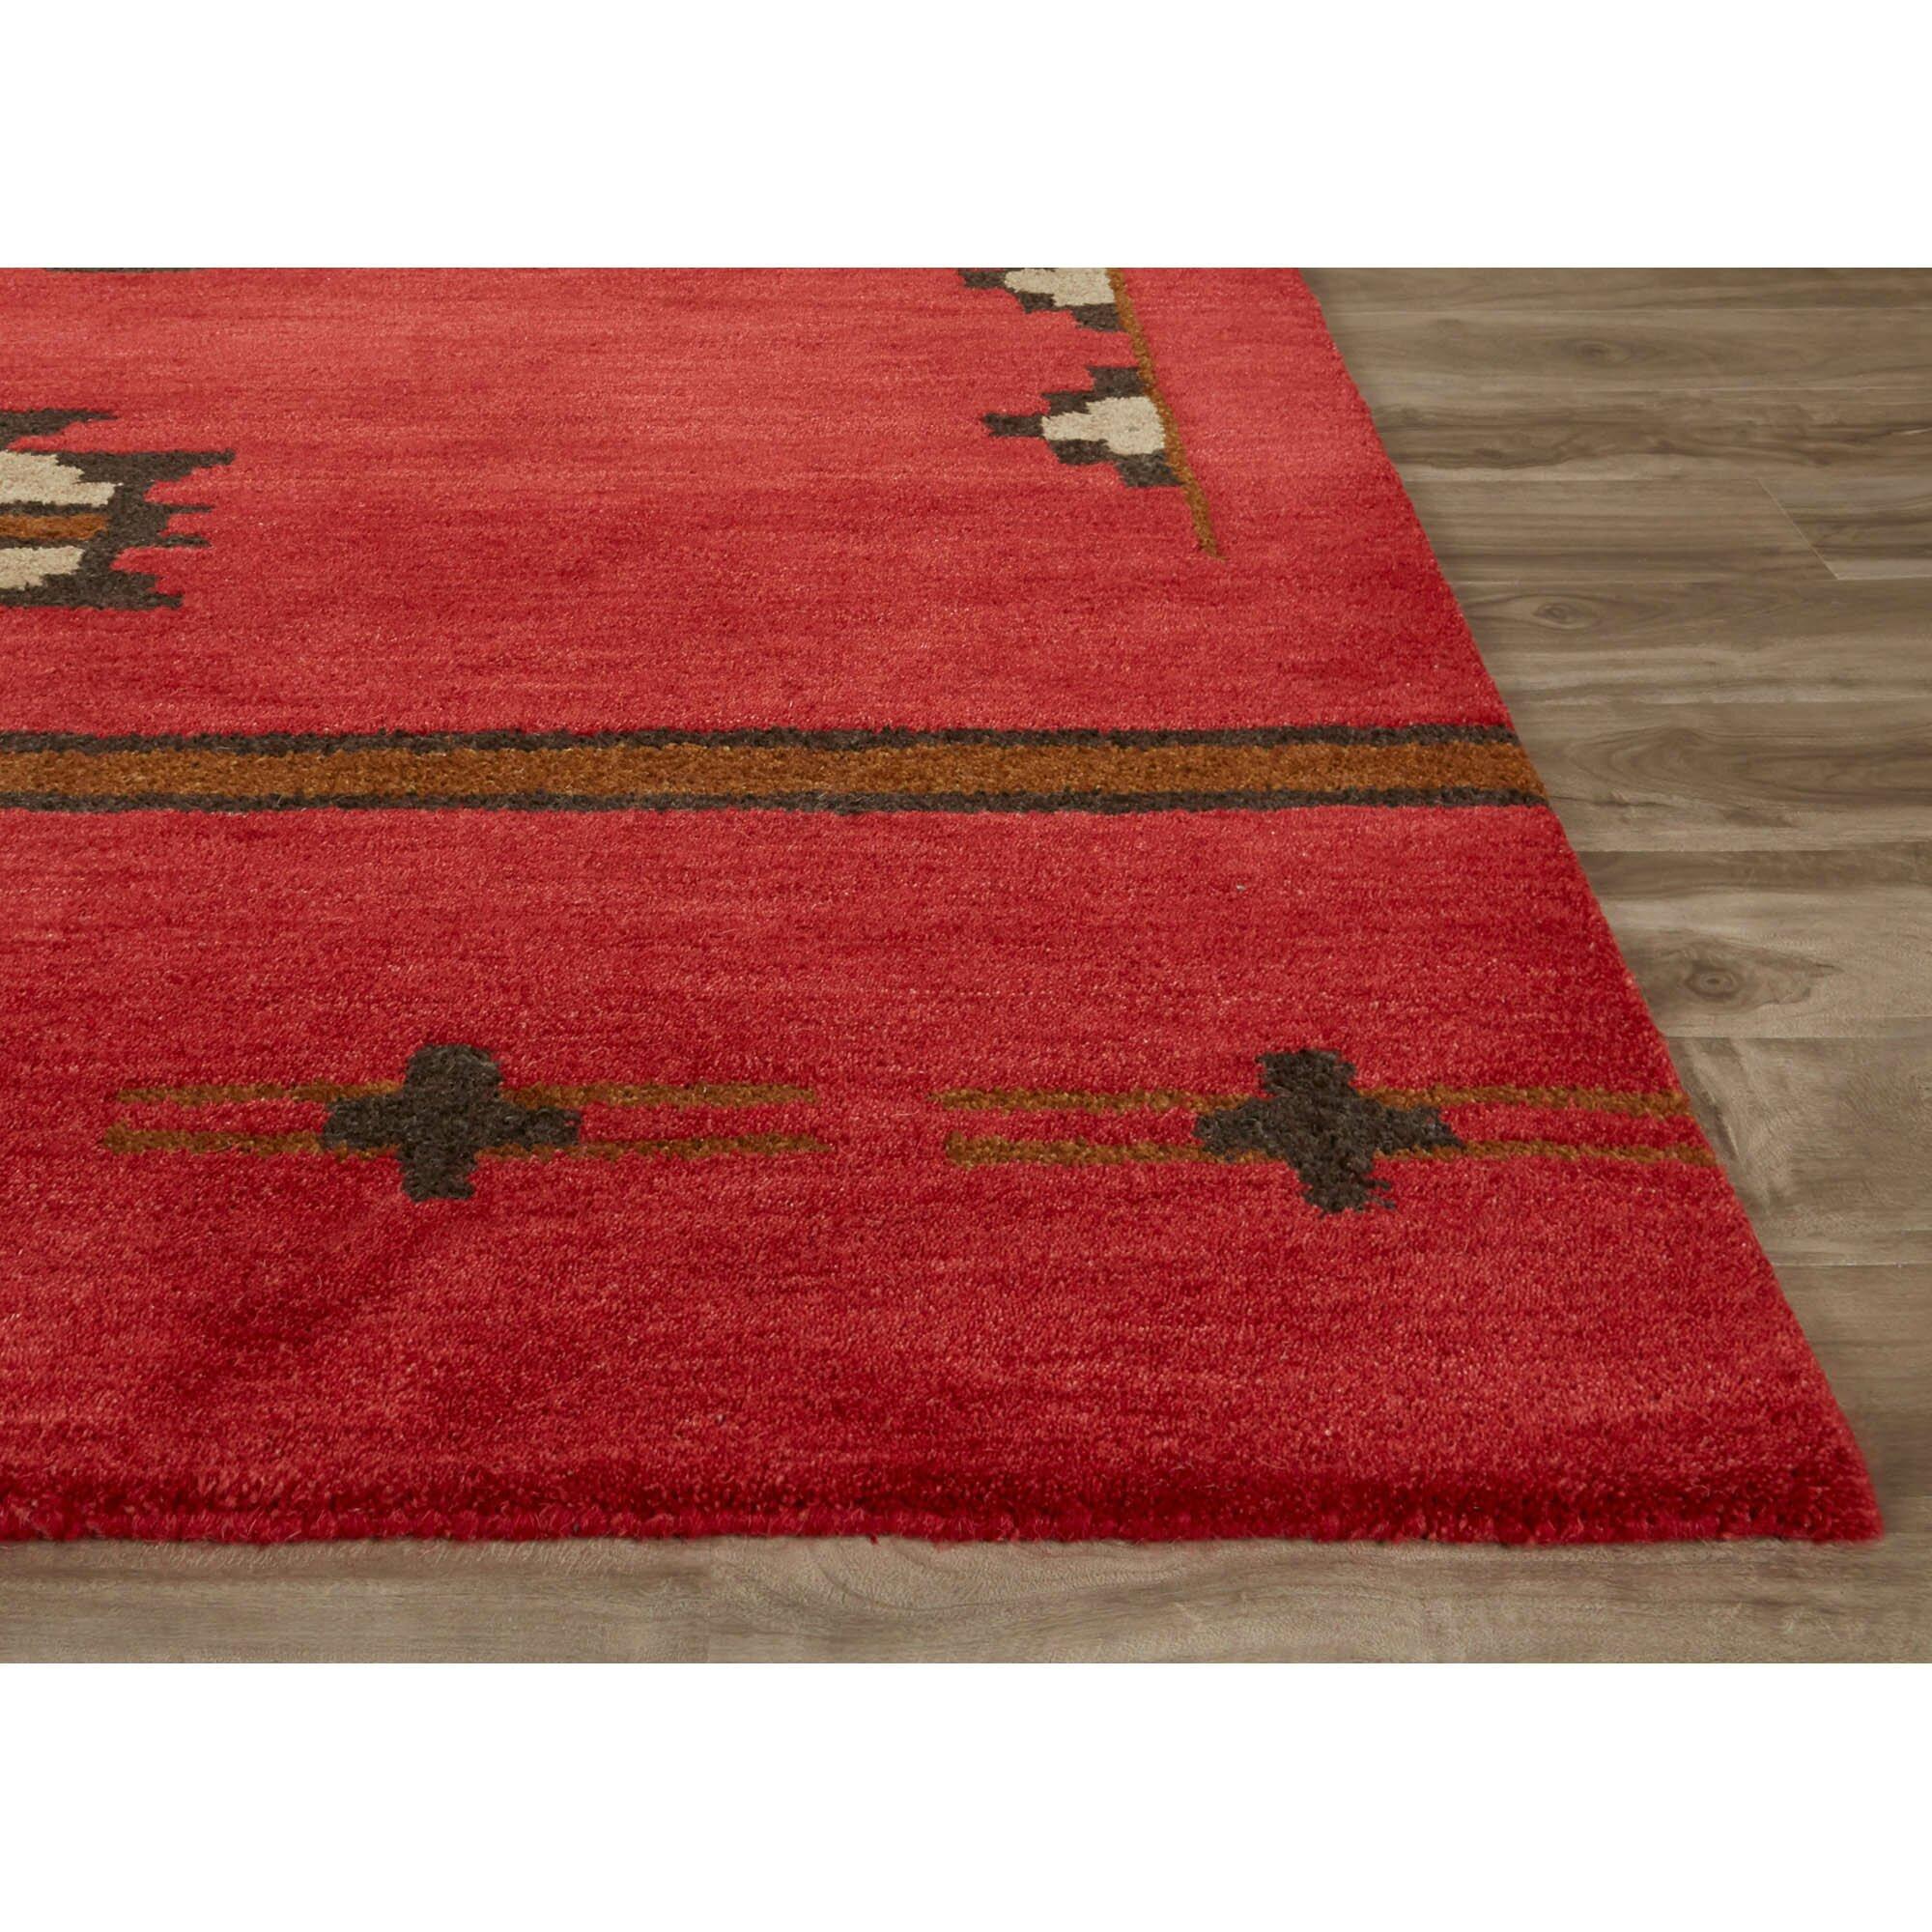 jaipurliving cabin hand tufted red gray area rug wayfair. Black Bedroom Furniture Sets. Home Design Ideas